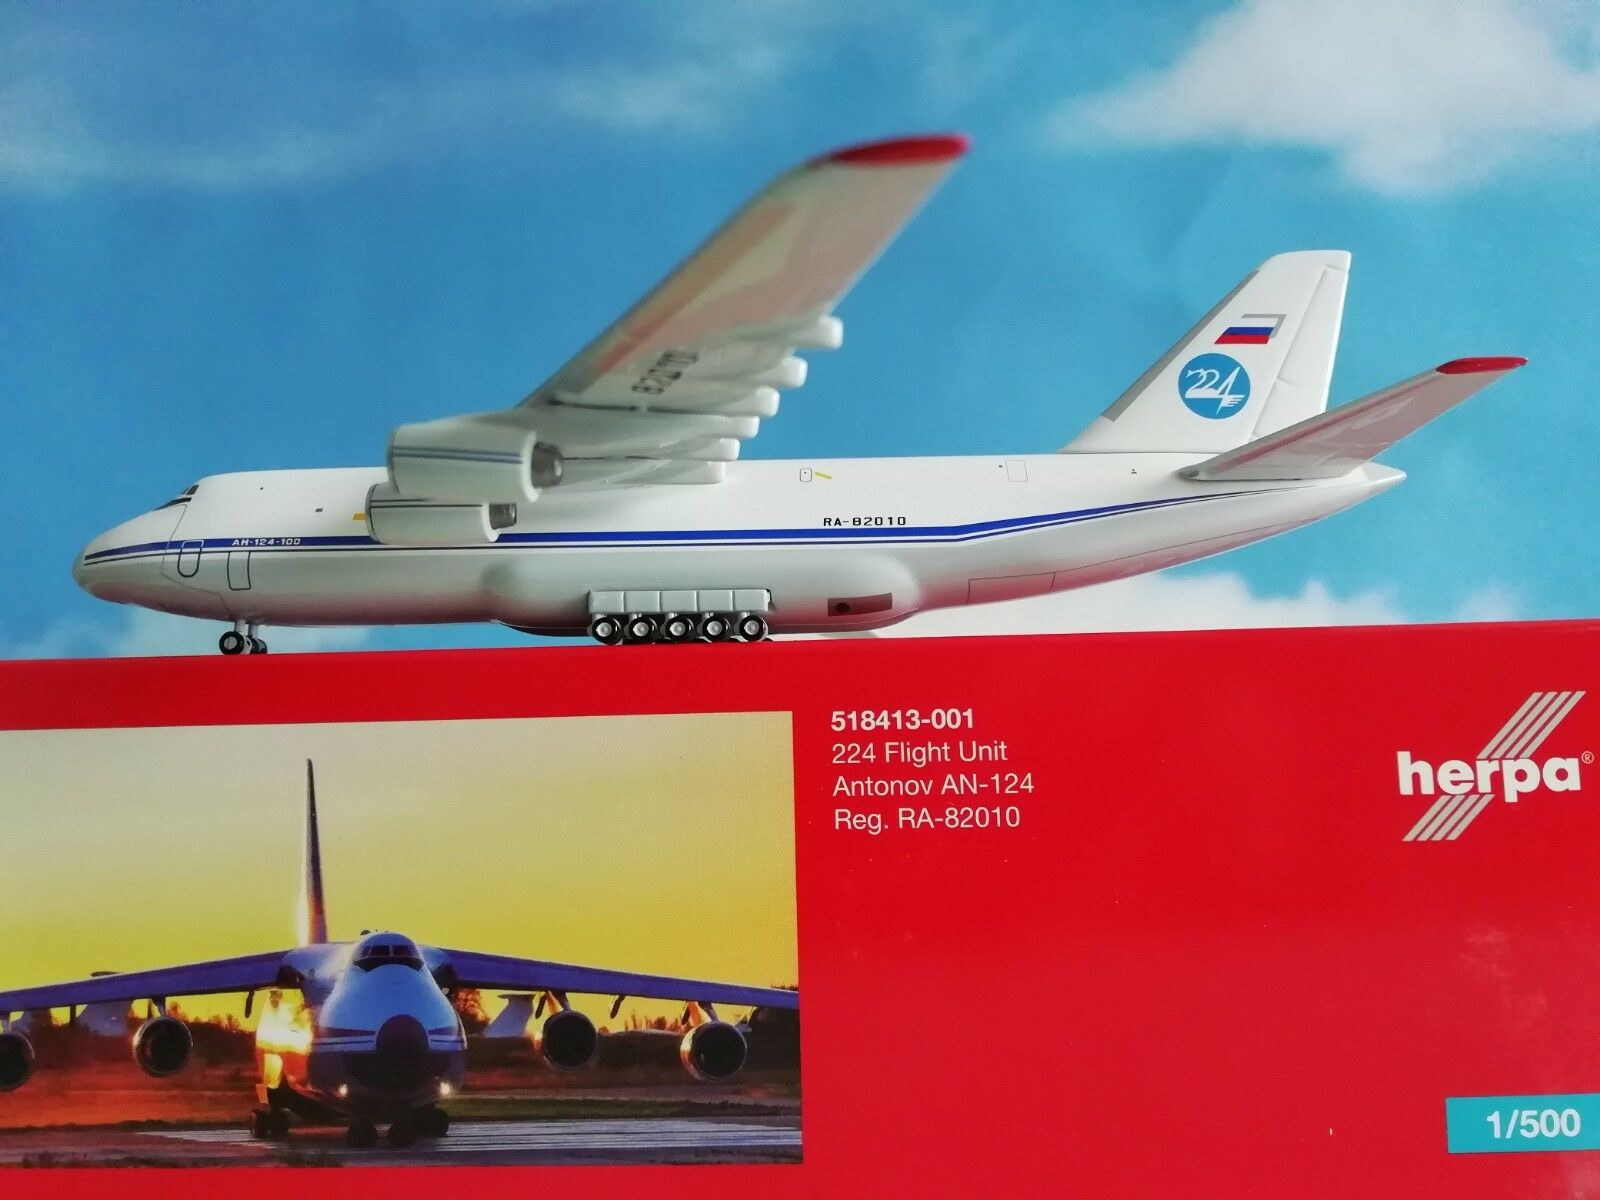 1 500 518413-001  224th Flight Unit Antonov AN-124 Herpa wings 1 500